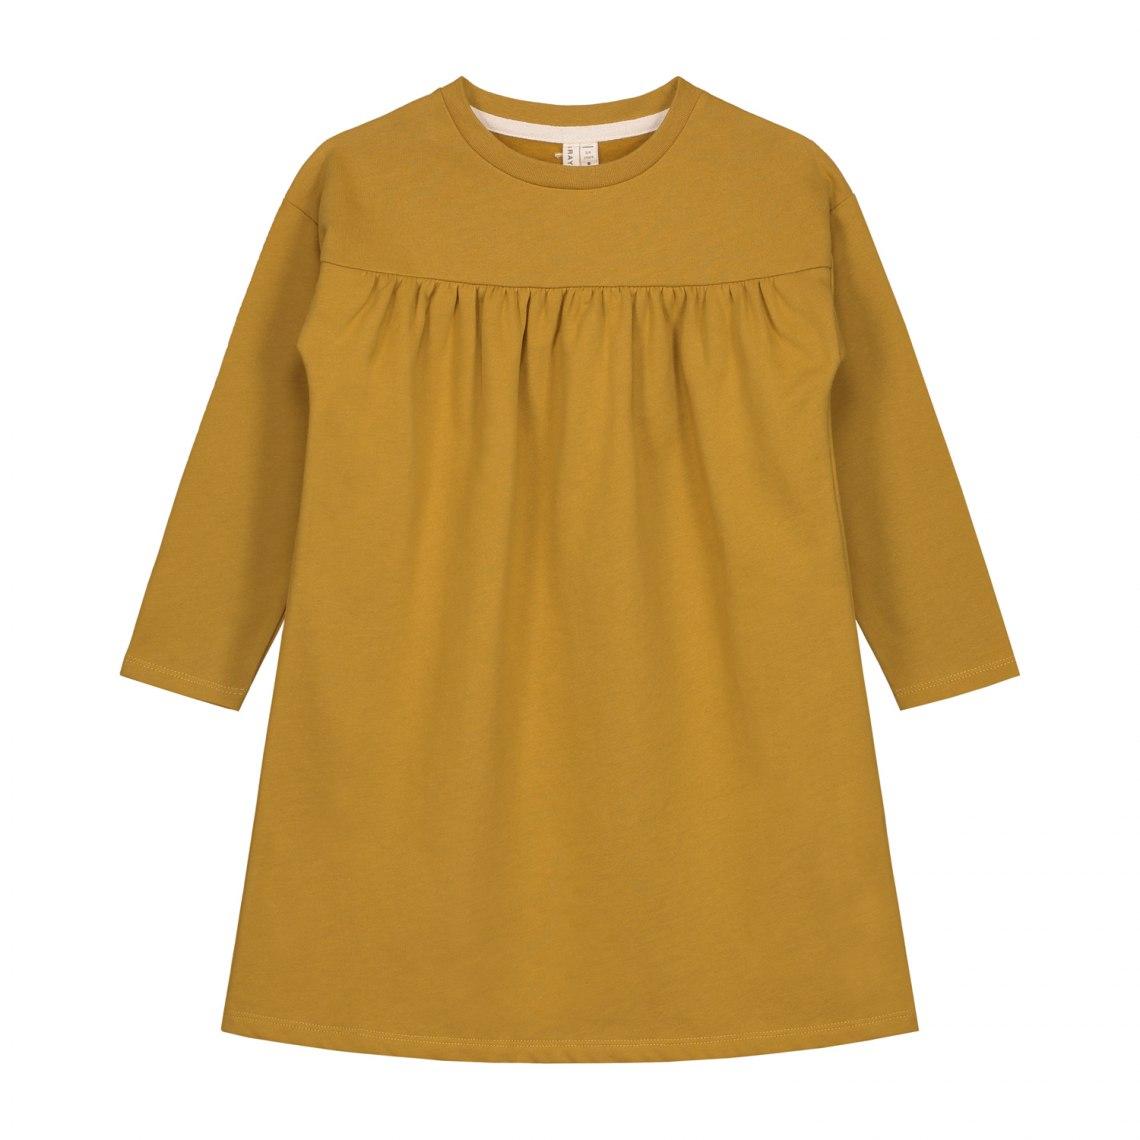 d93b25313090 + × graylabel pleated dress mustard front  1 .jpg